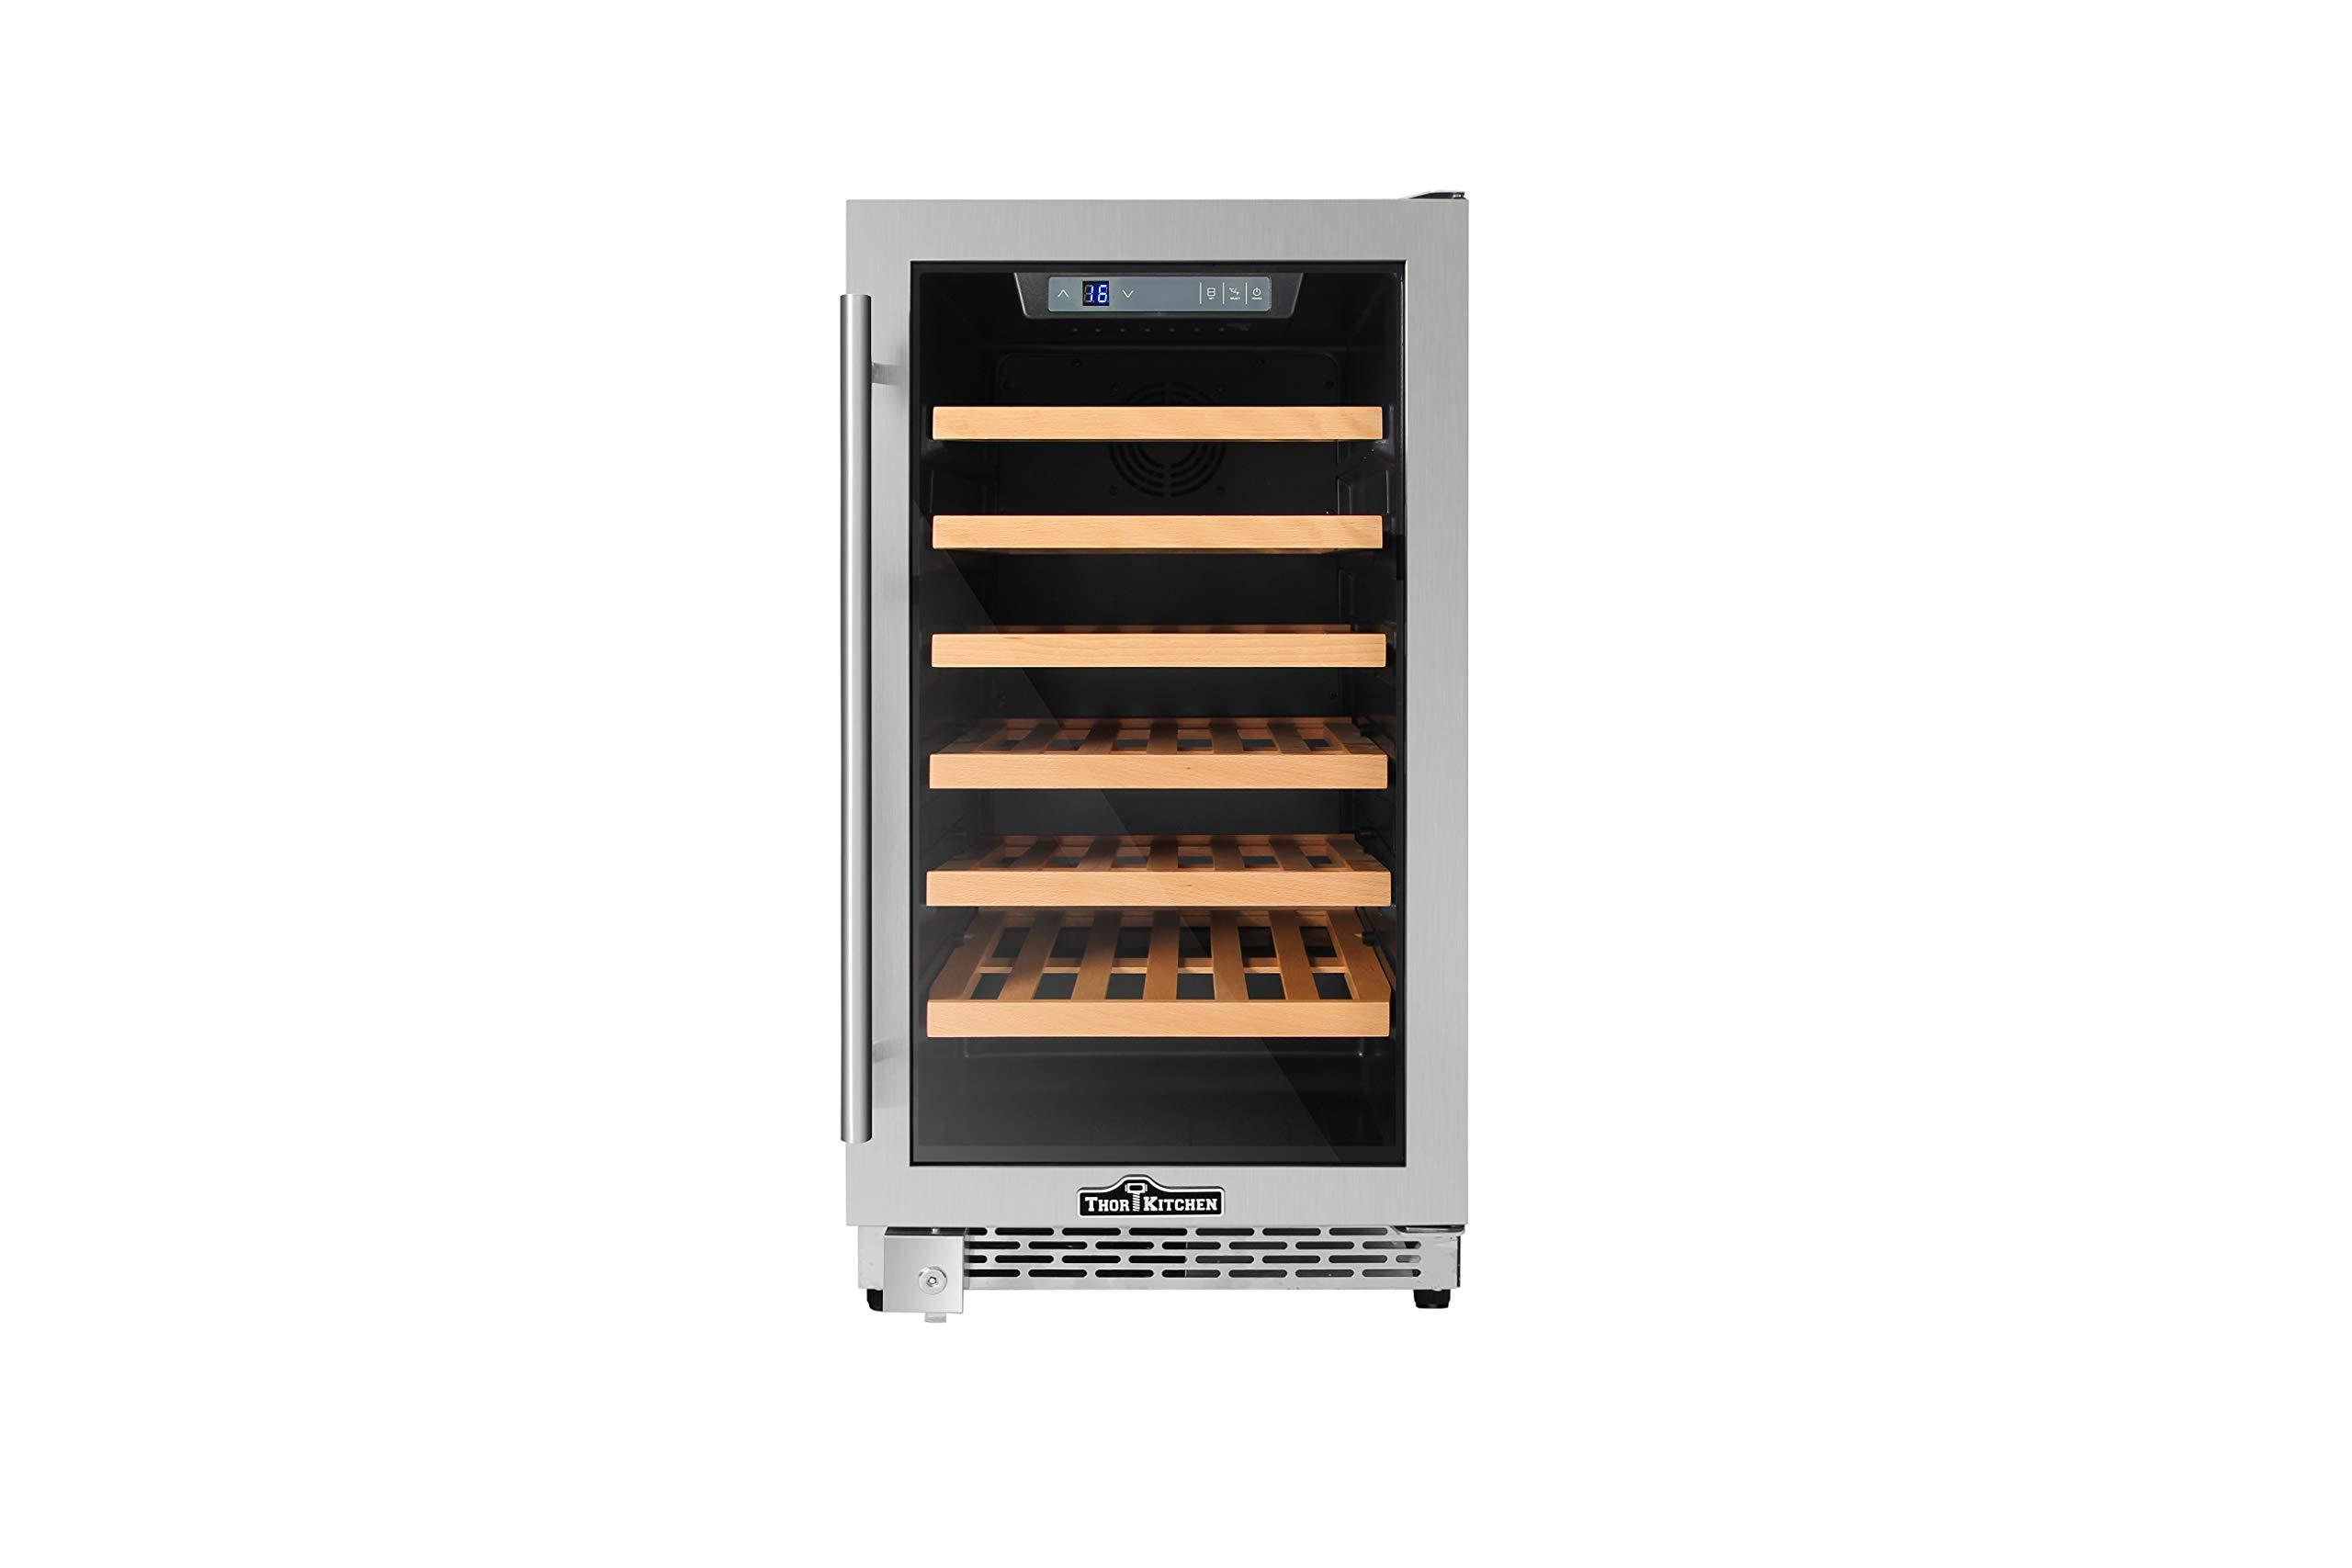 Thorkitchen HWC2405U 40 Bottles 18'' Built-in Wine Cooler, stainless steel